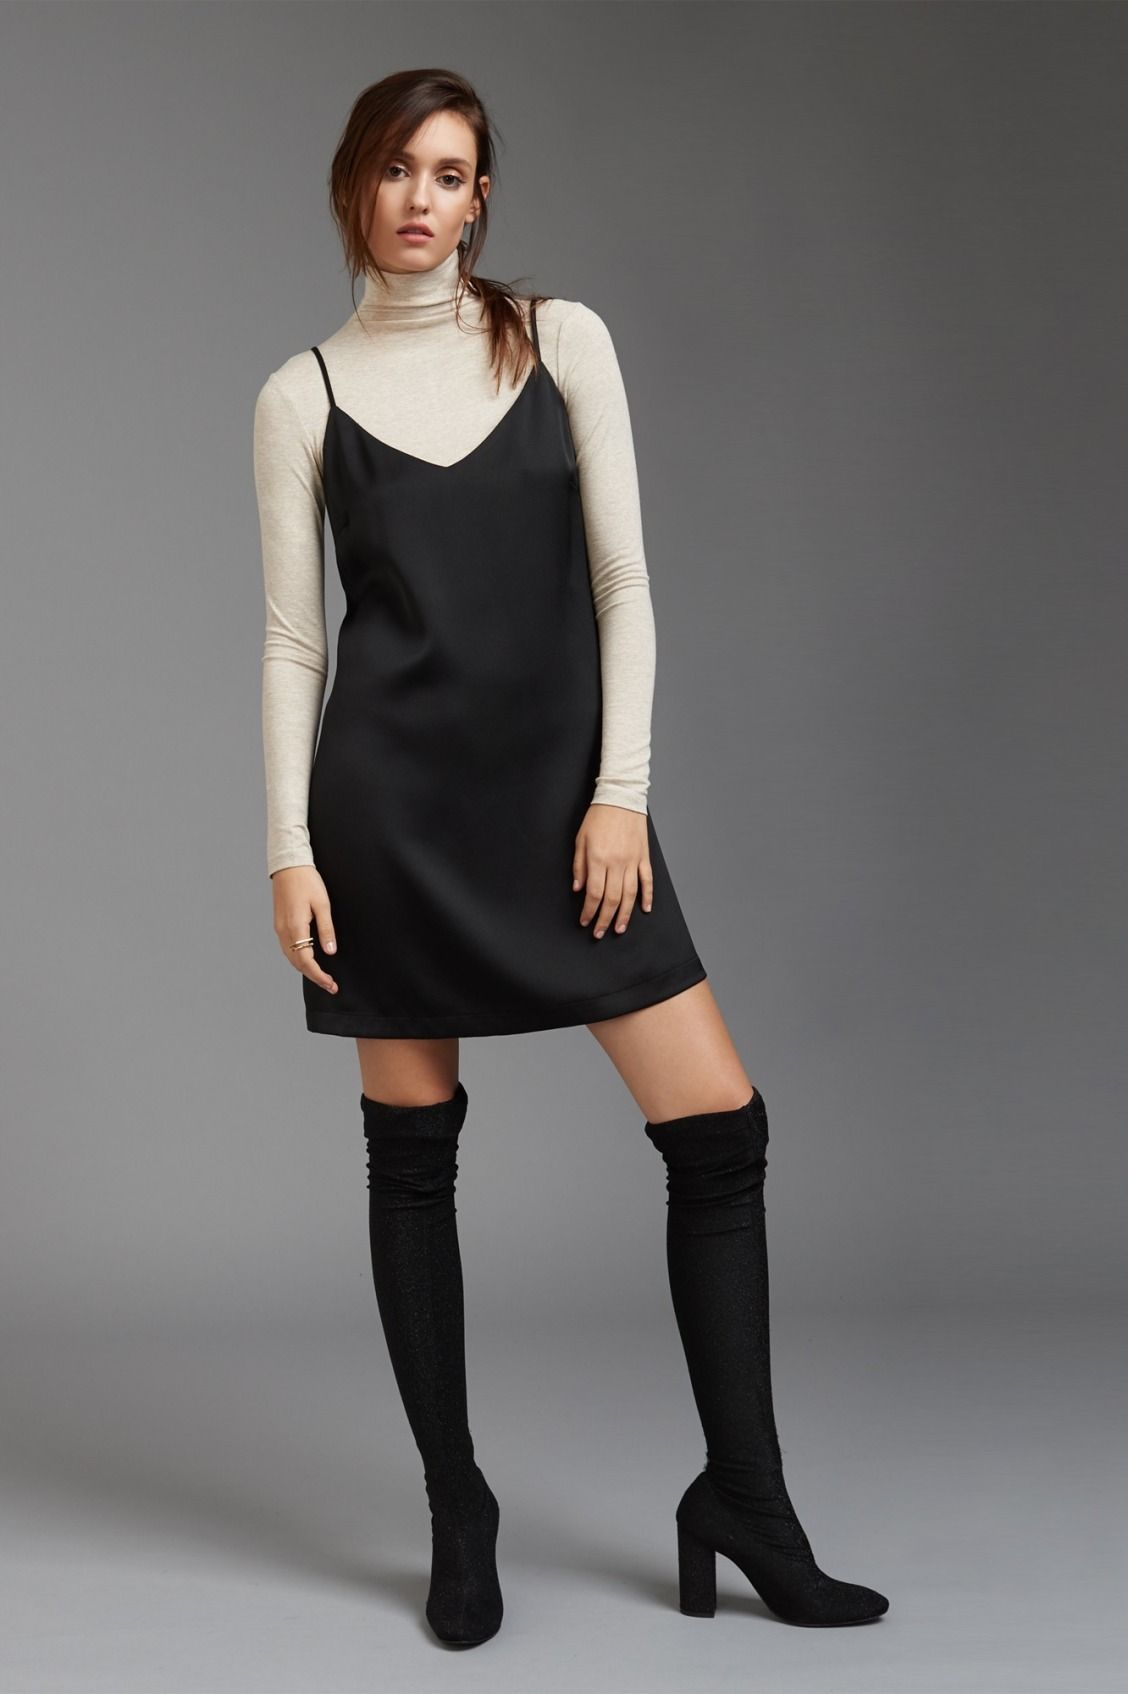 layering 101 slip dress over turtleneck my style dresses